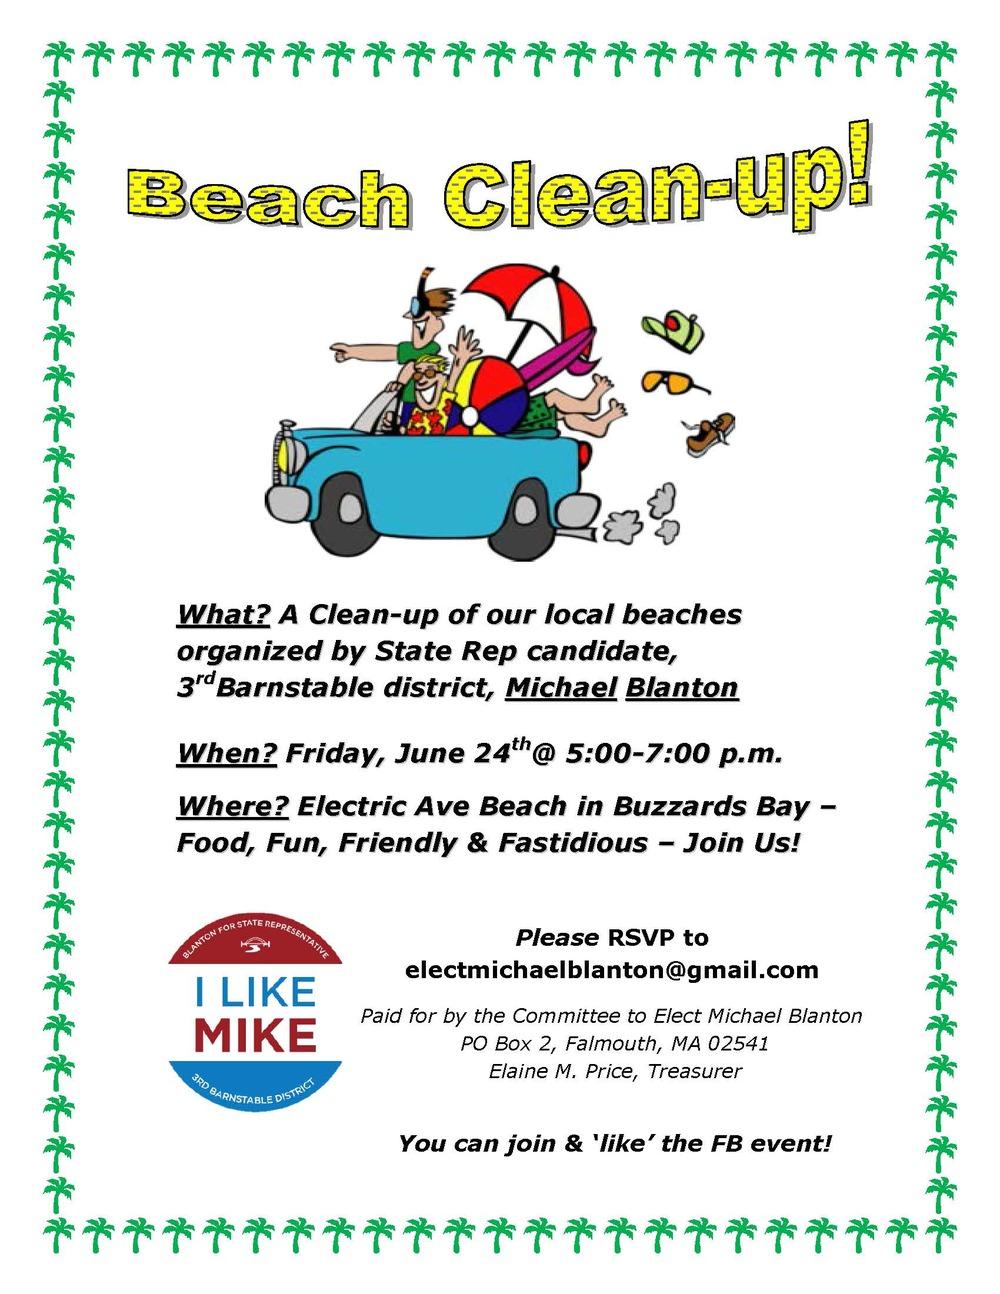 Beach Clean-up flier (6-24-16).jpg